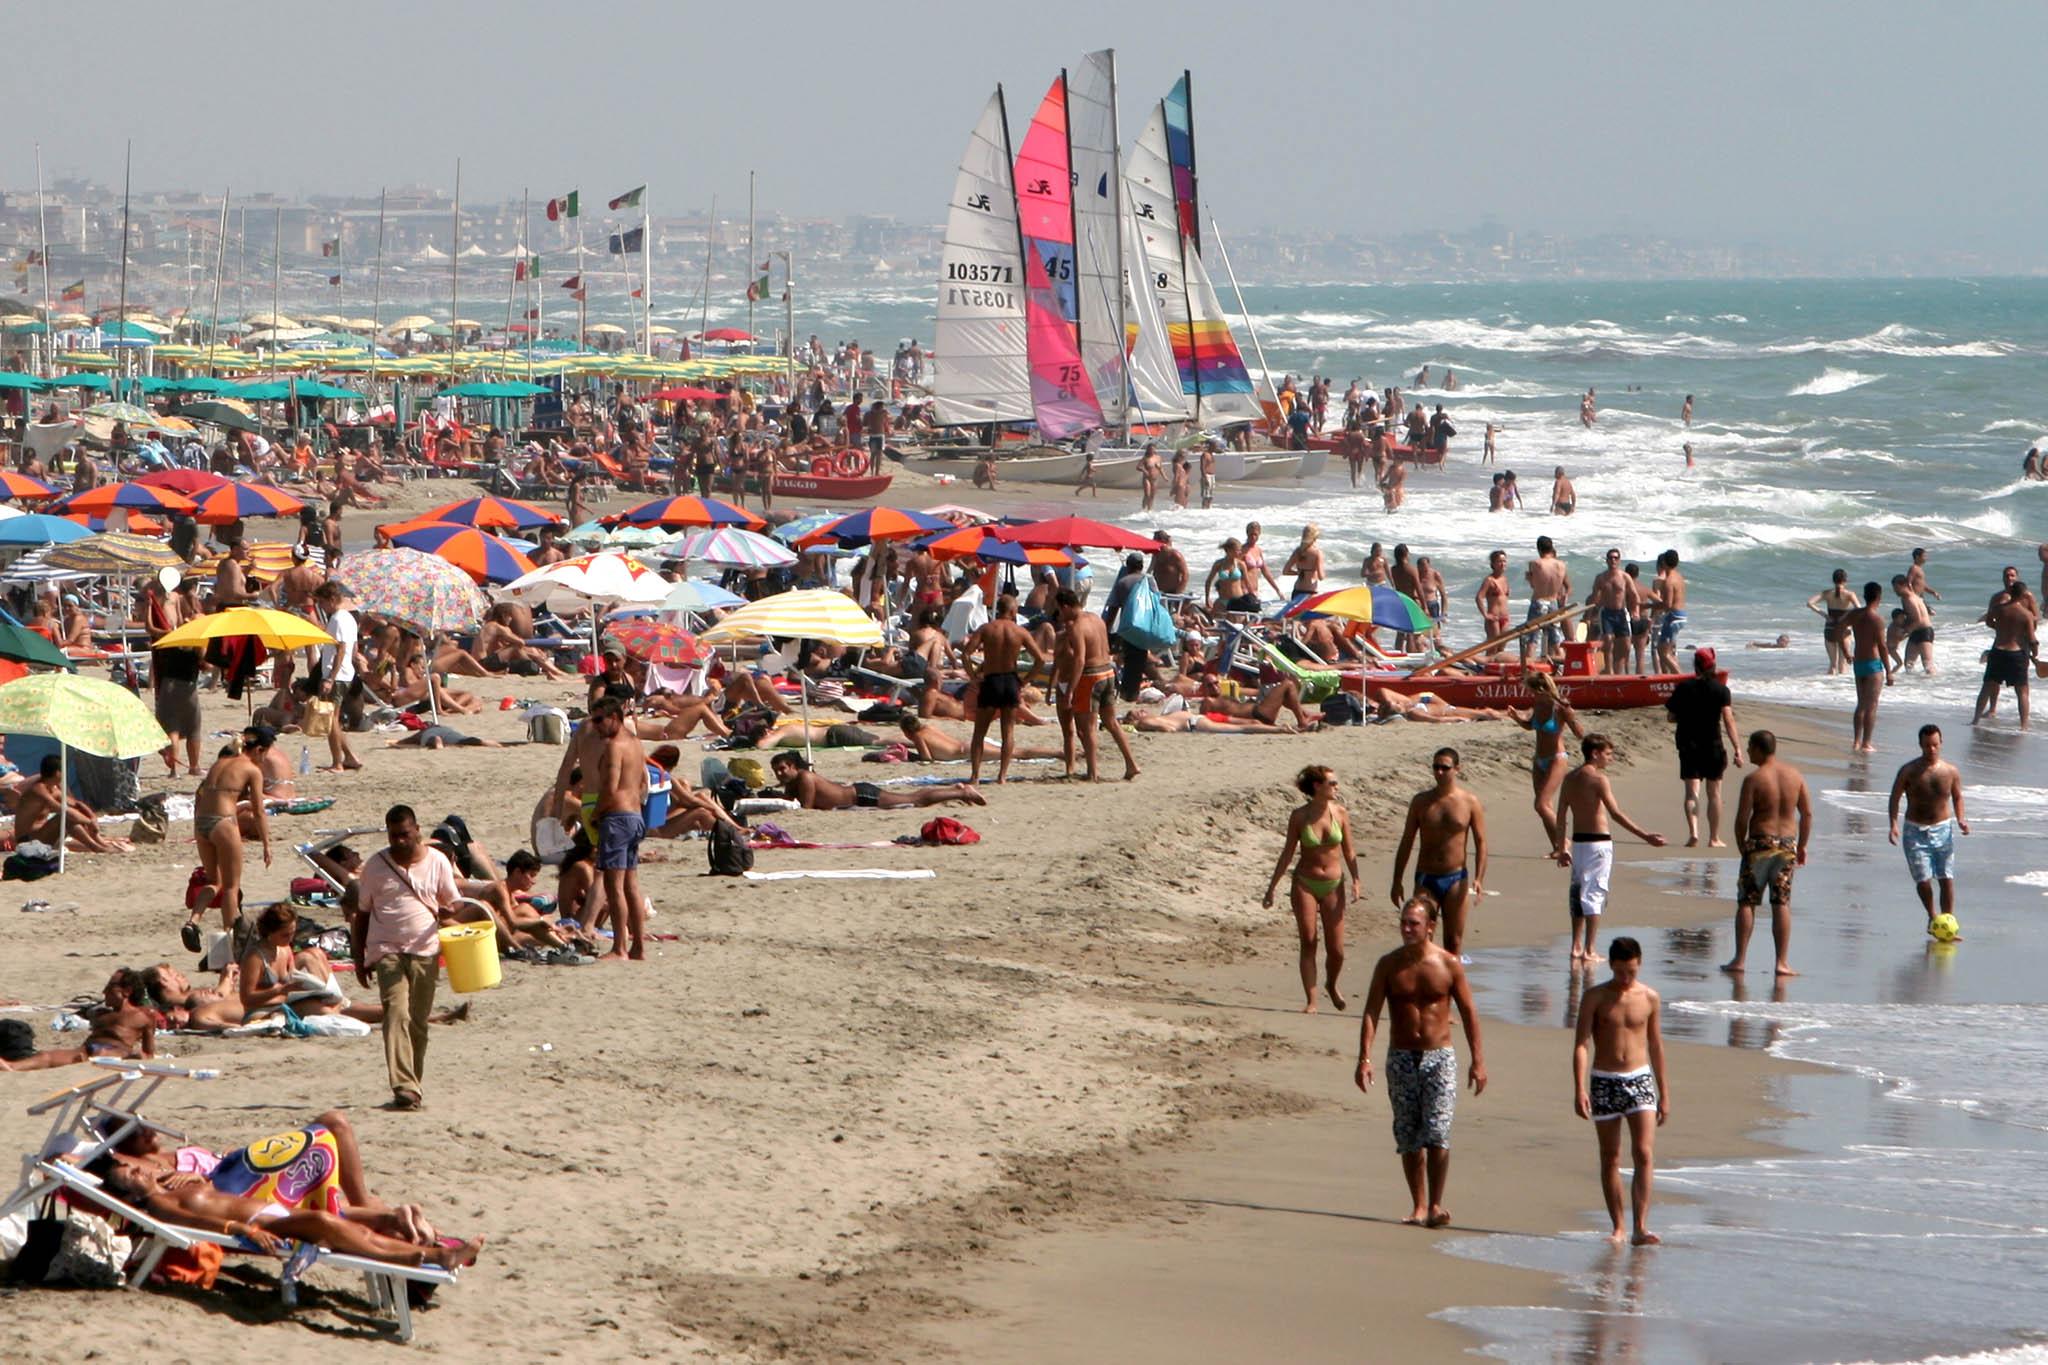 Matrimonio In Spiaggia Ostia : Ostia baci sulla spiaggia omosessuali allontanati e l